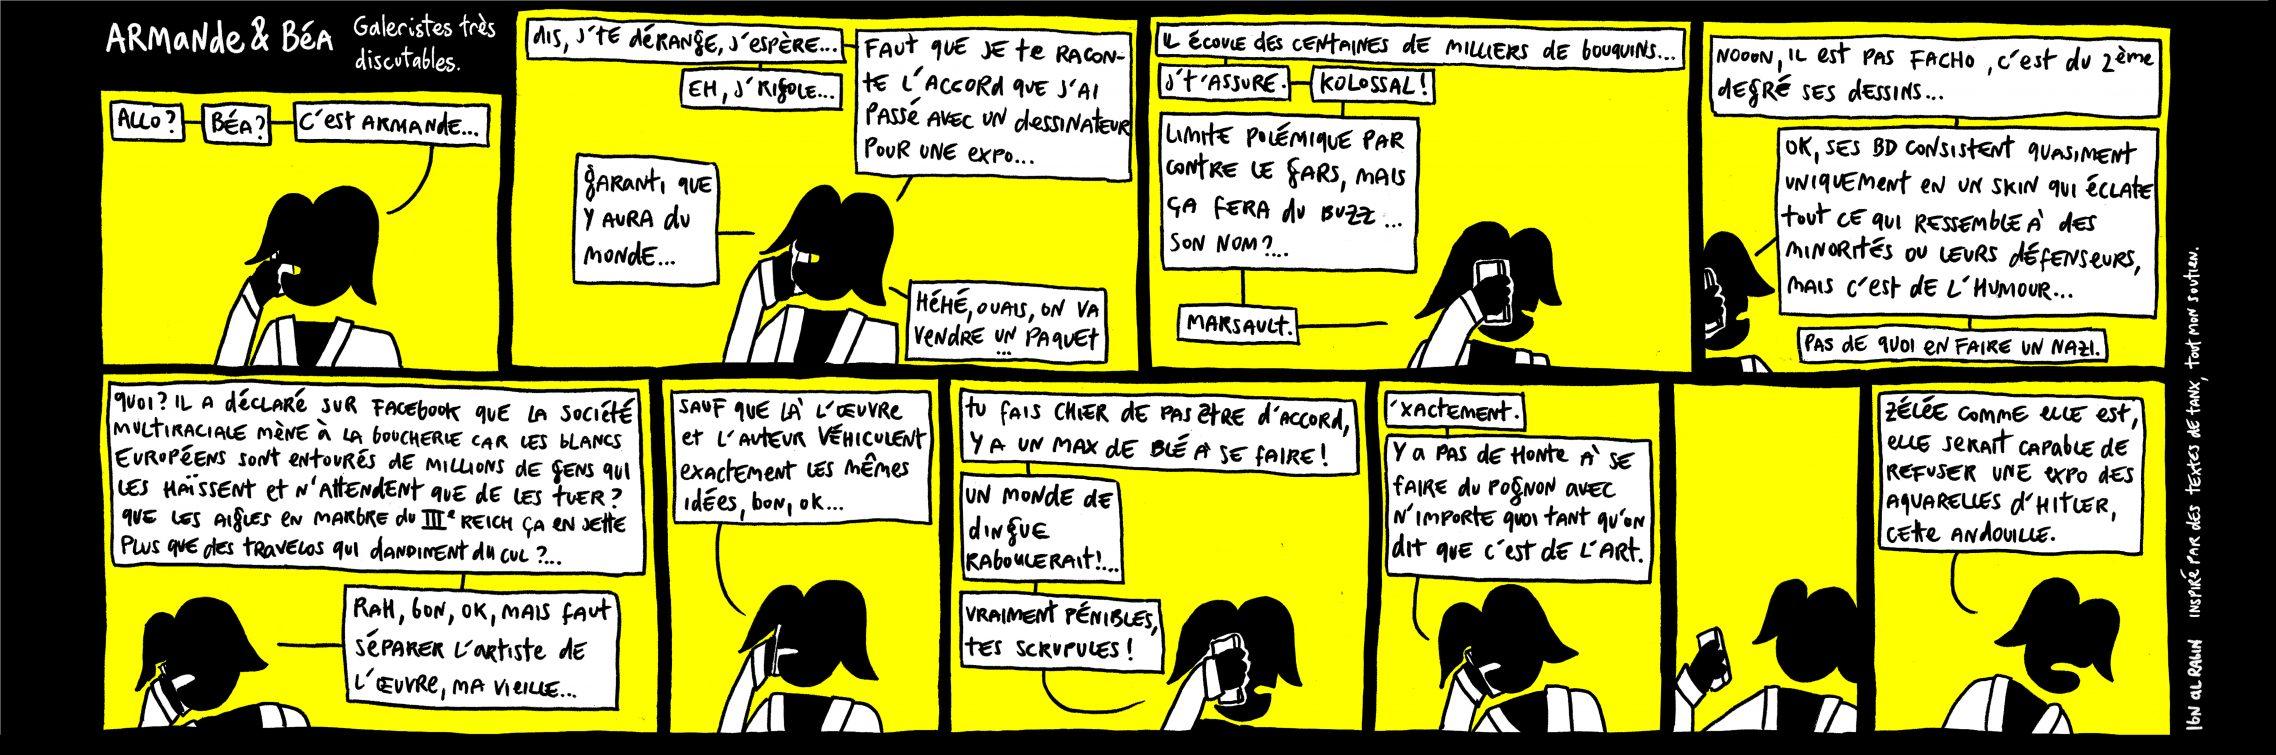 Galeristes très discutables